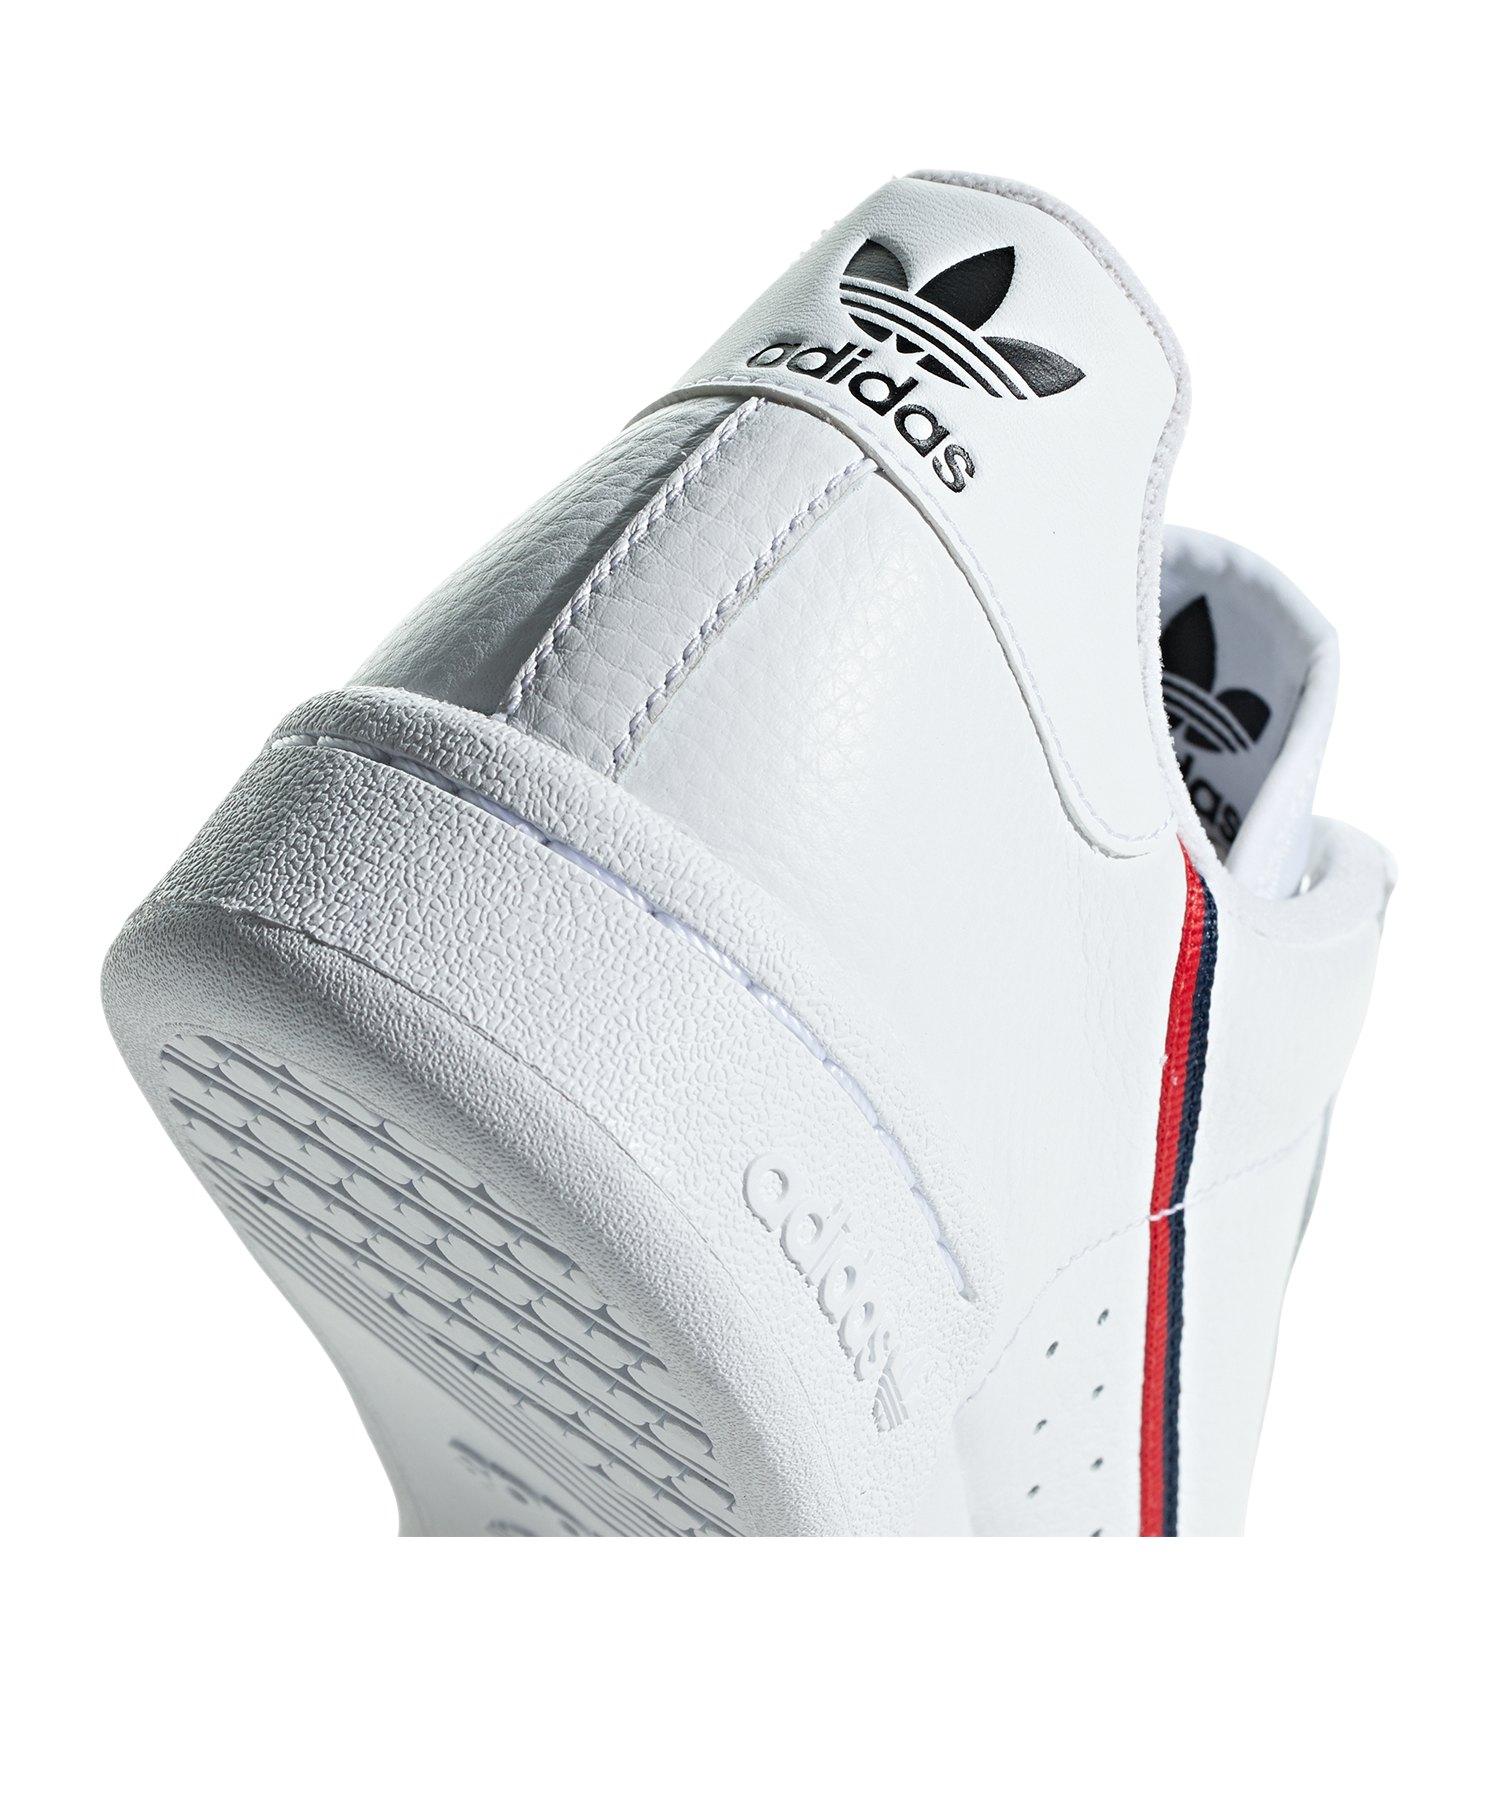 Weiss Sneaker Adidas Continental 80 Originals wTlOXPkZiu